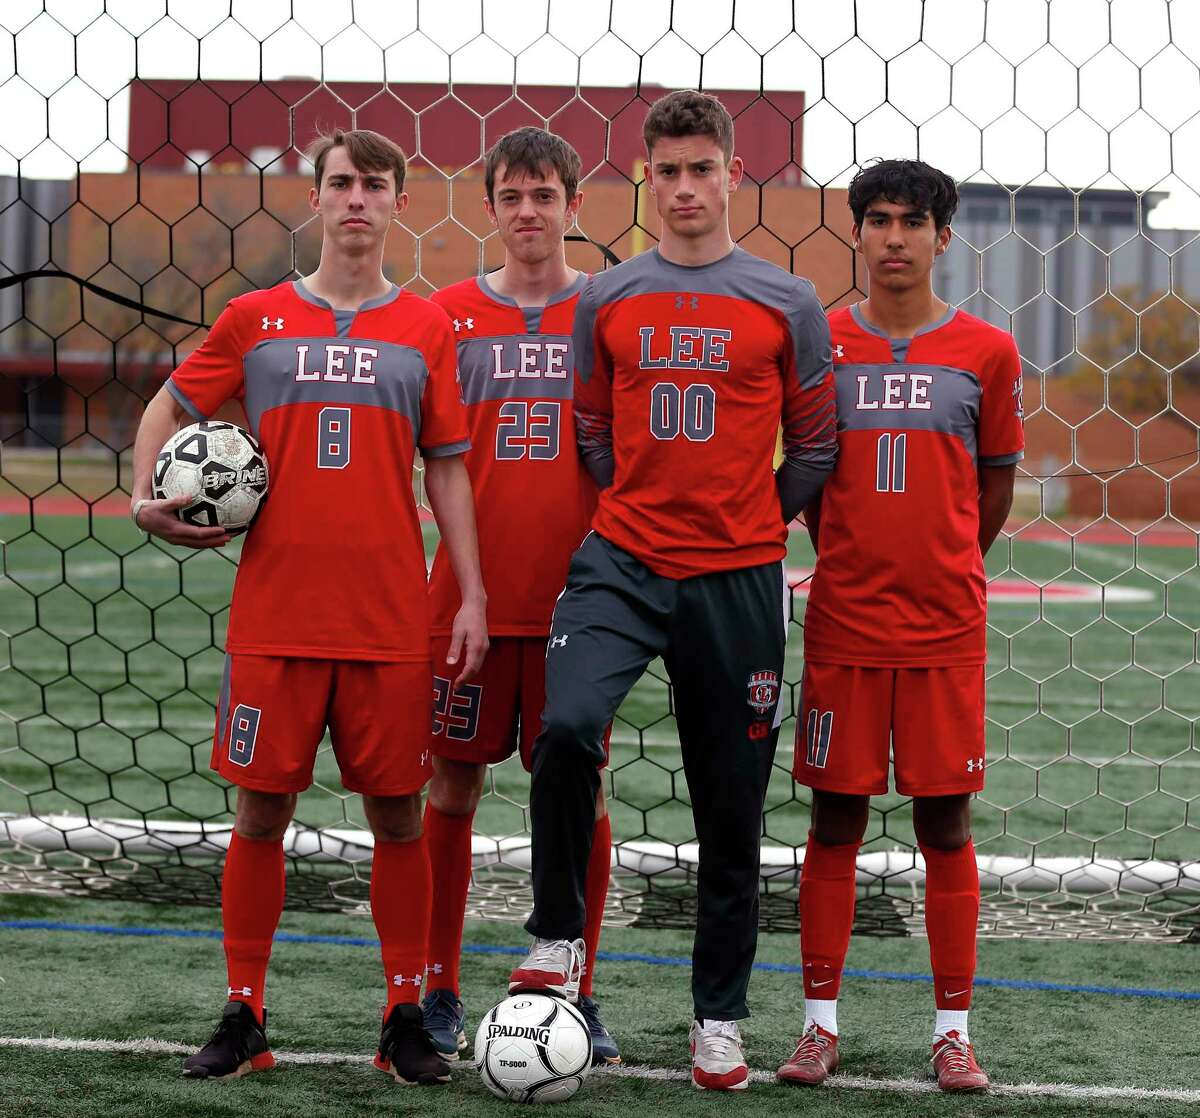 Joey Batrouni,foot on ball,Lto R, Gavin Seesholtz,Henry Bowland and Jonathan Facio. Protrait of Lee soccer captains on Tuesday, Dec. 22, 2020.